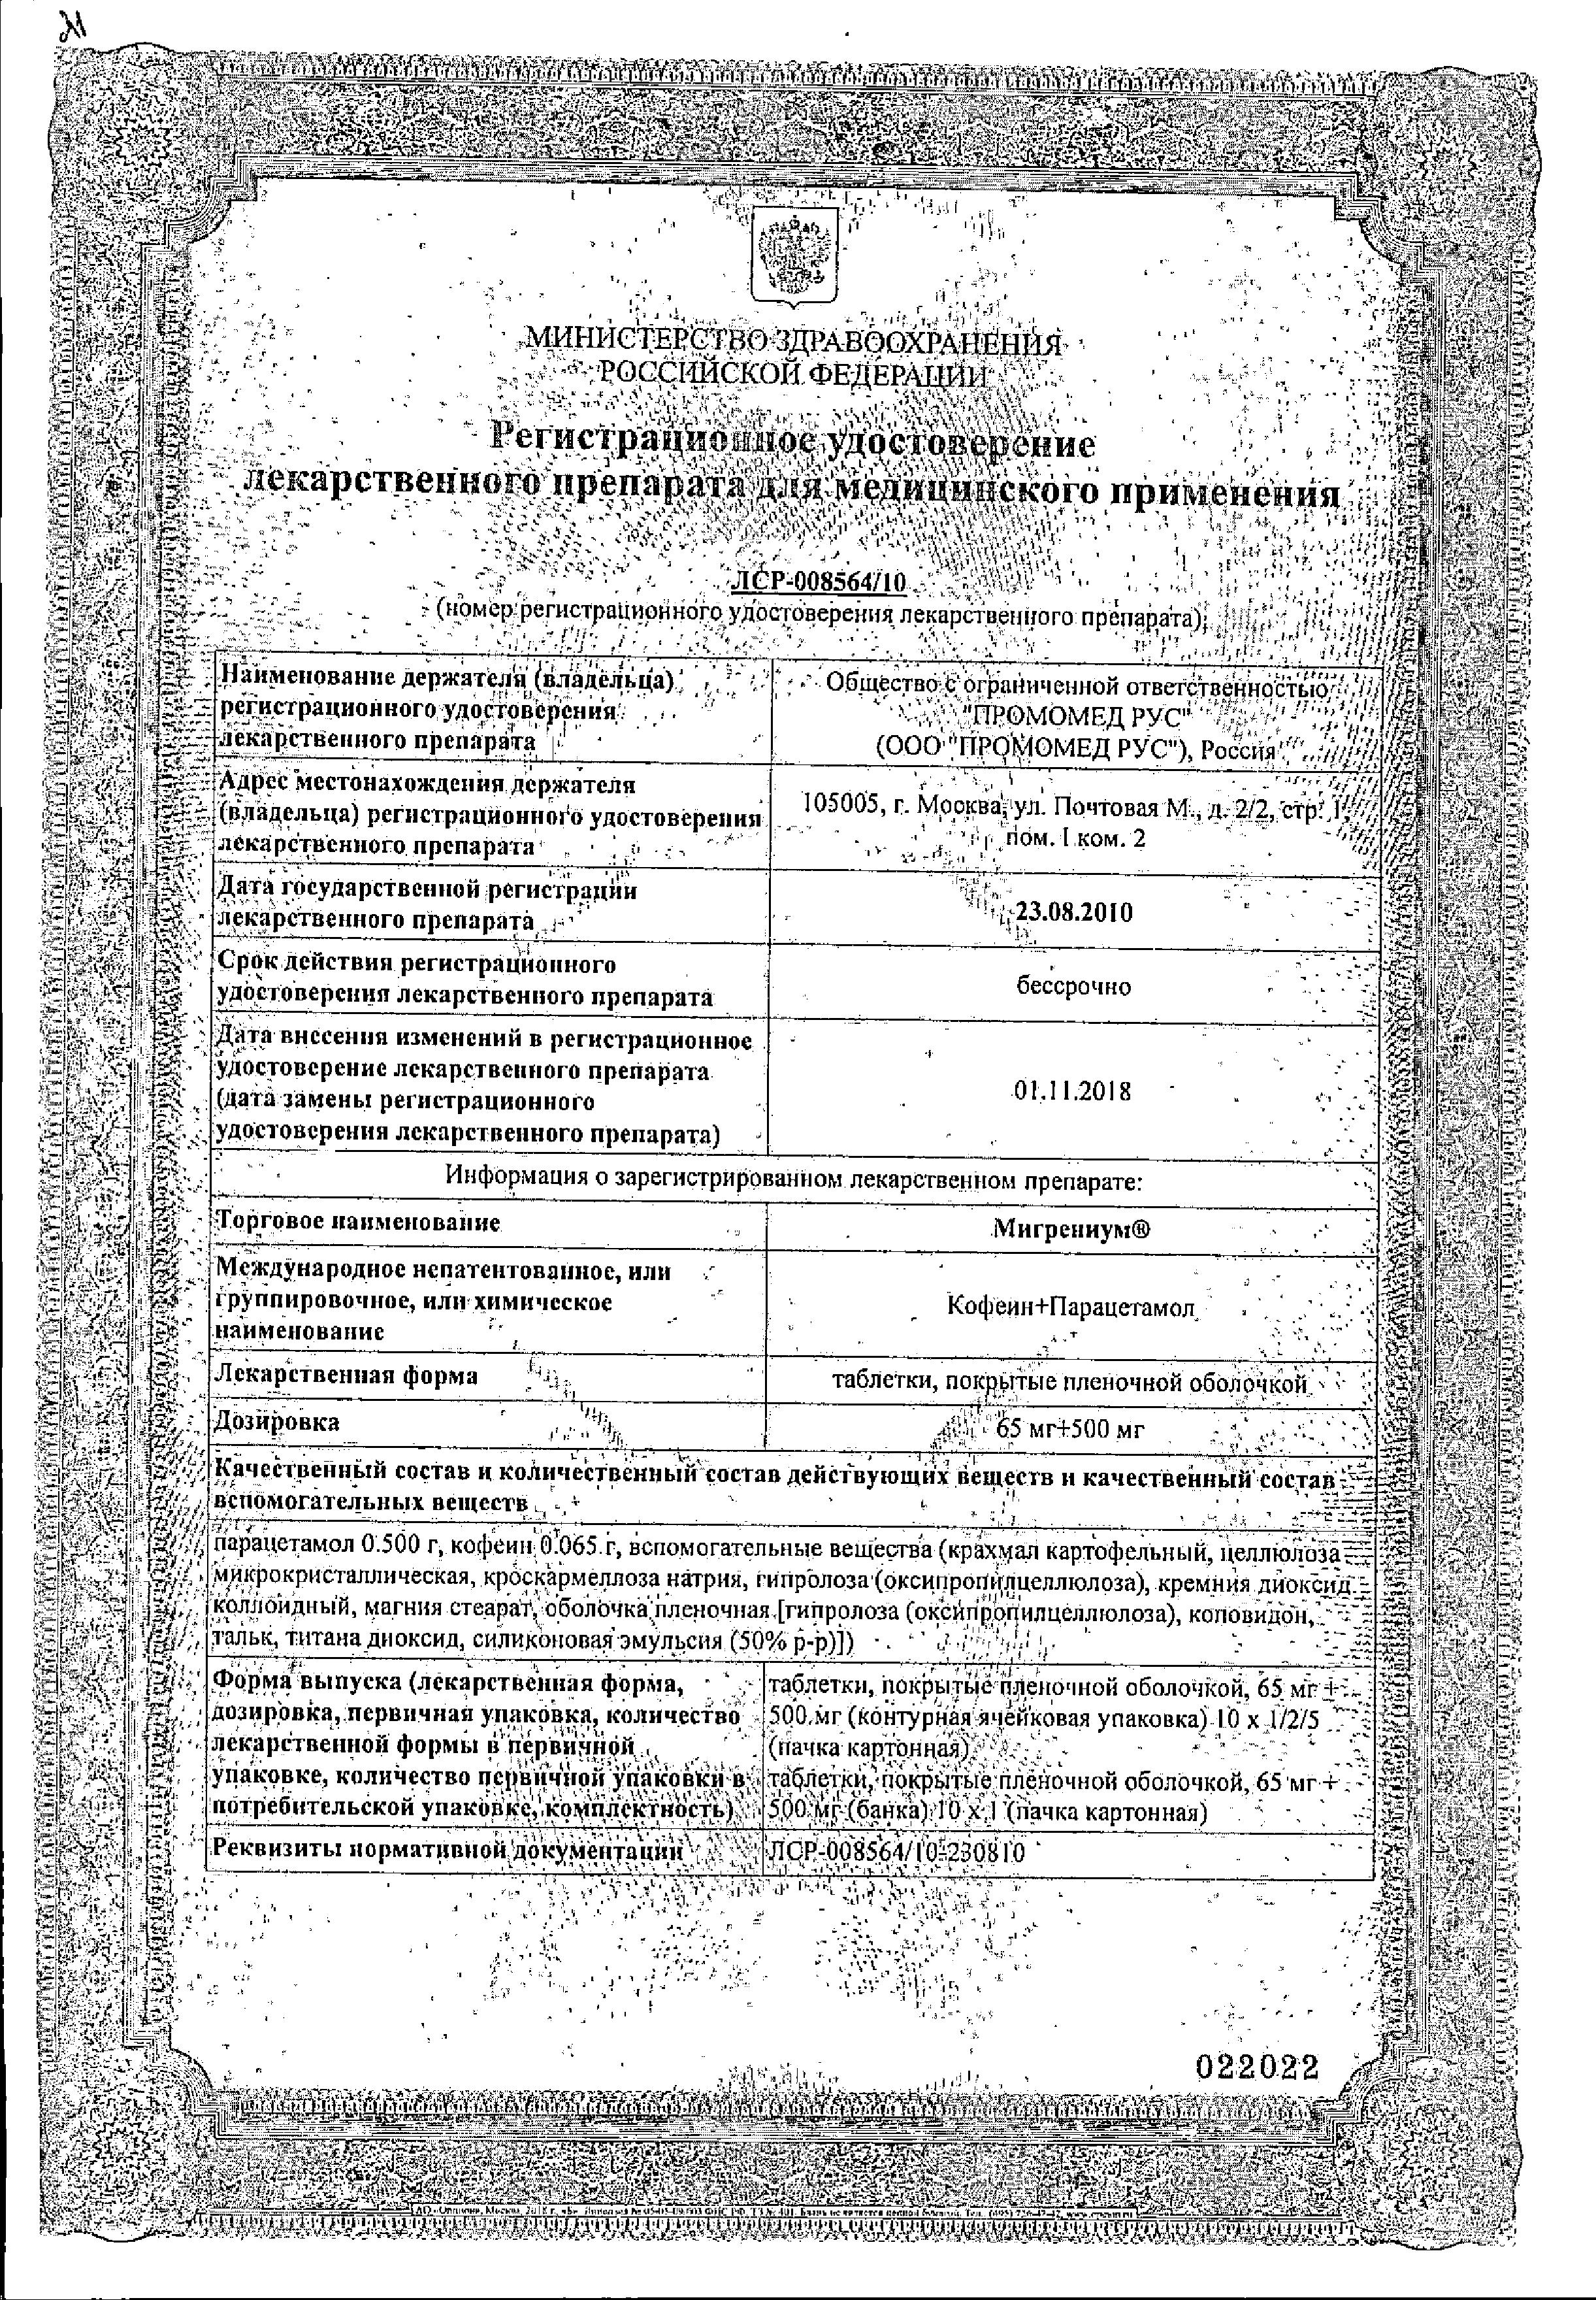 Мигрениум сертификат